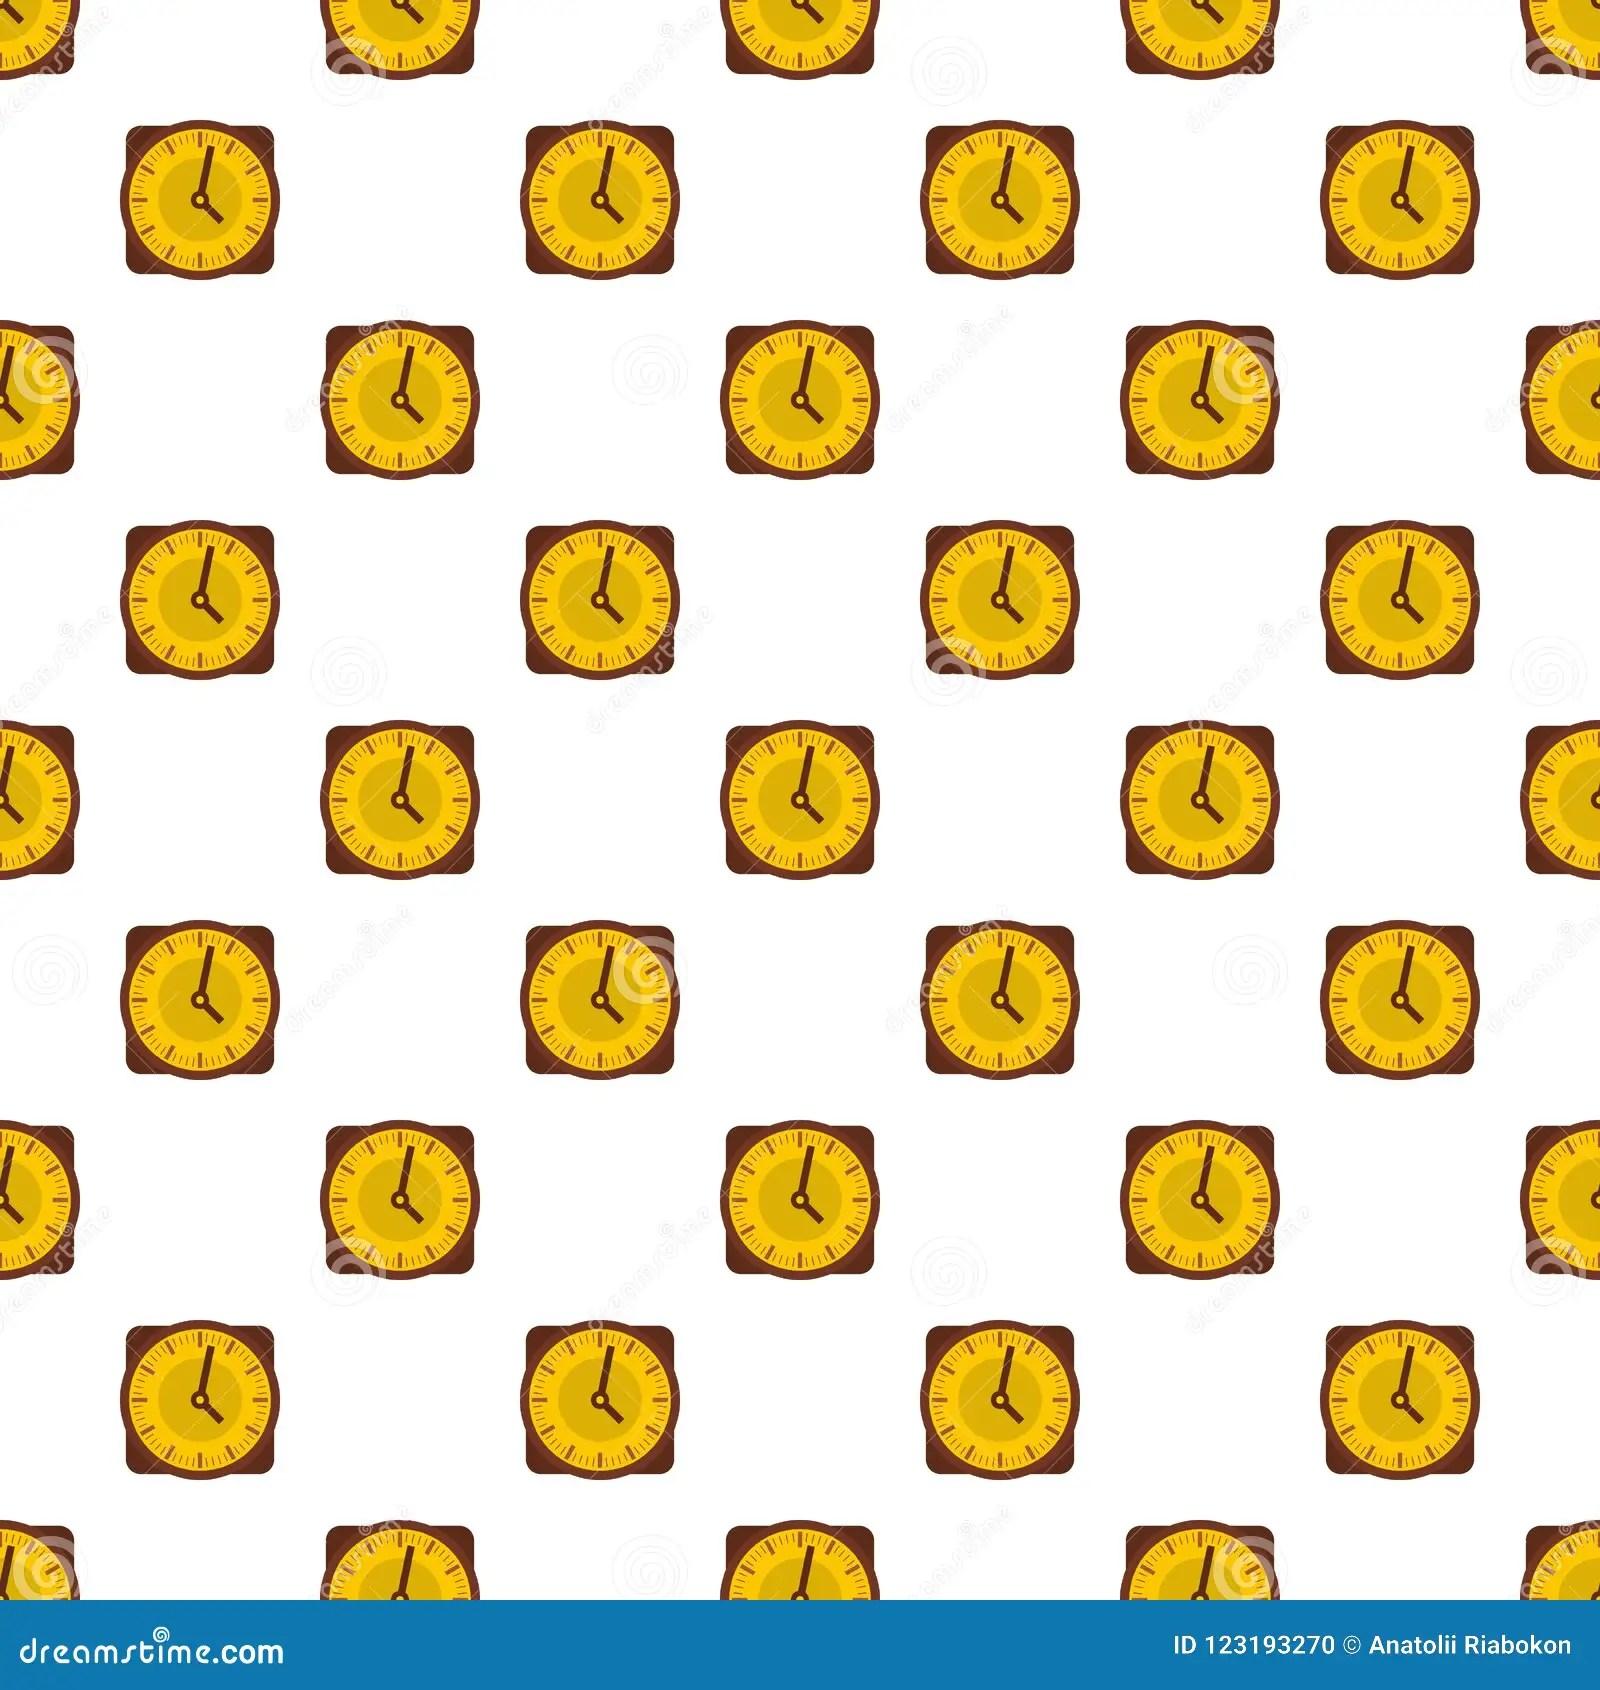 Clock Face Stopwatch Pattern Cartoon Vector